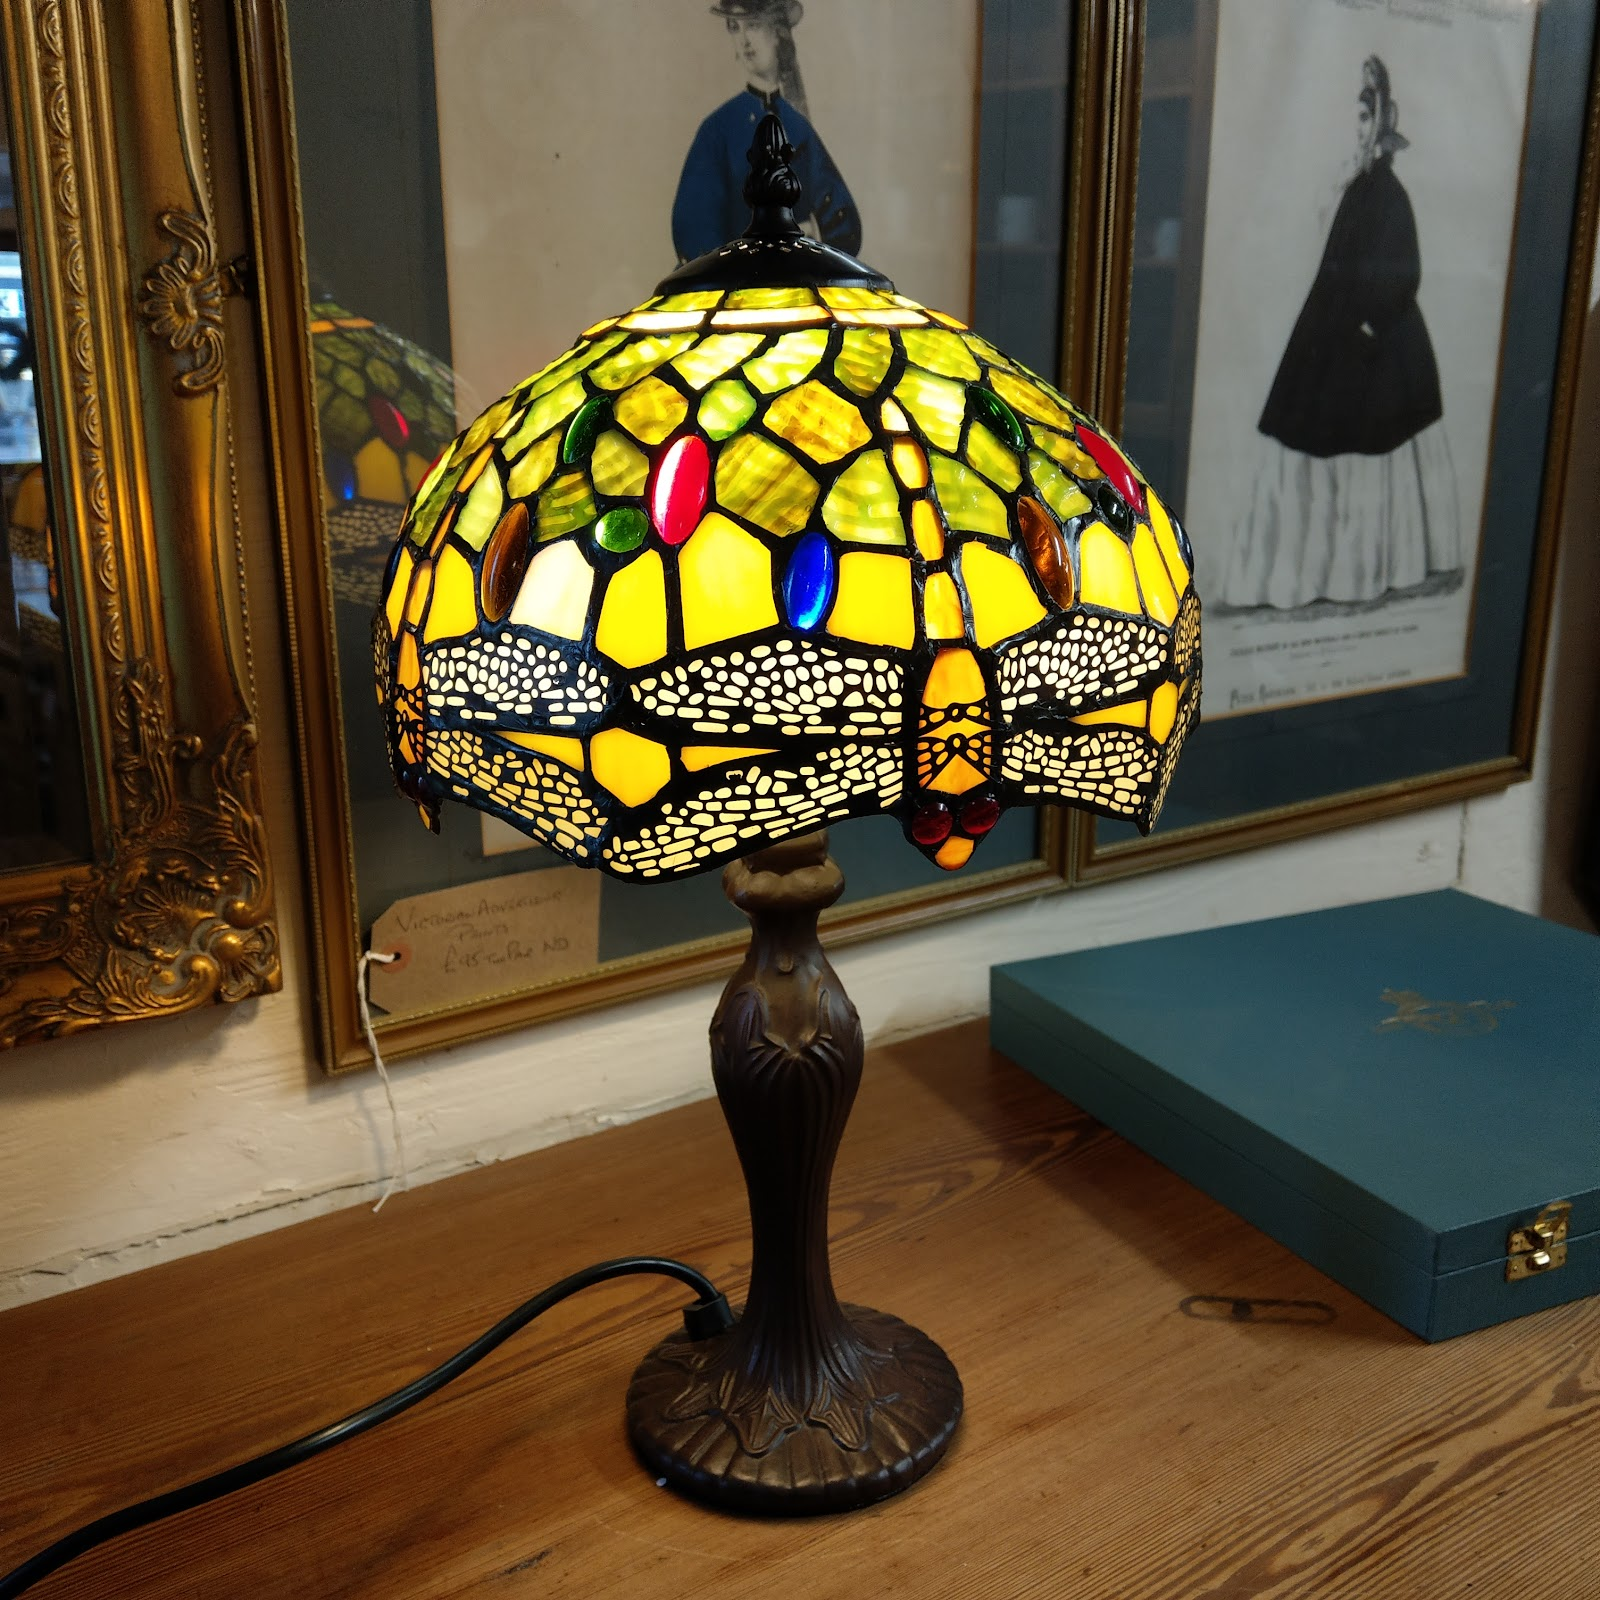 Lampu 'Tiffany' - source: tobysreclamation.com